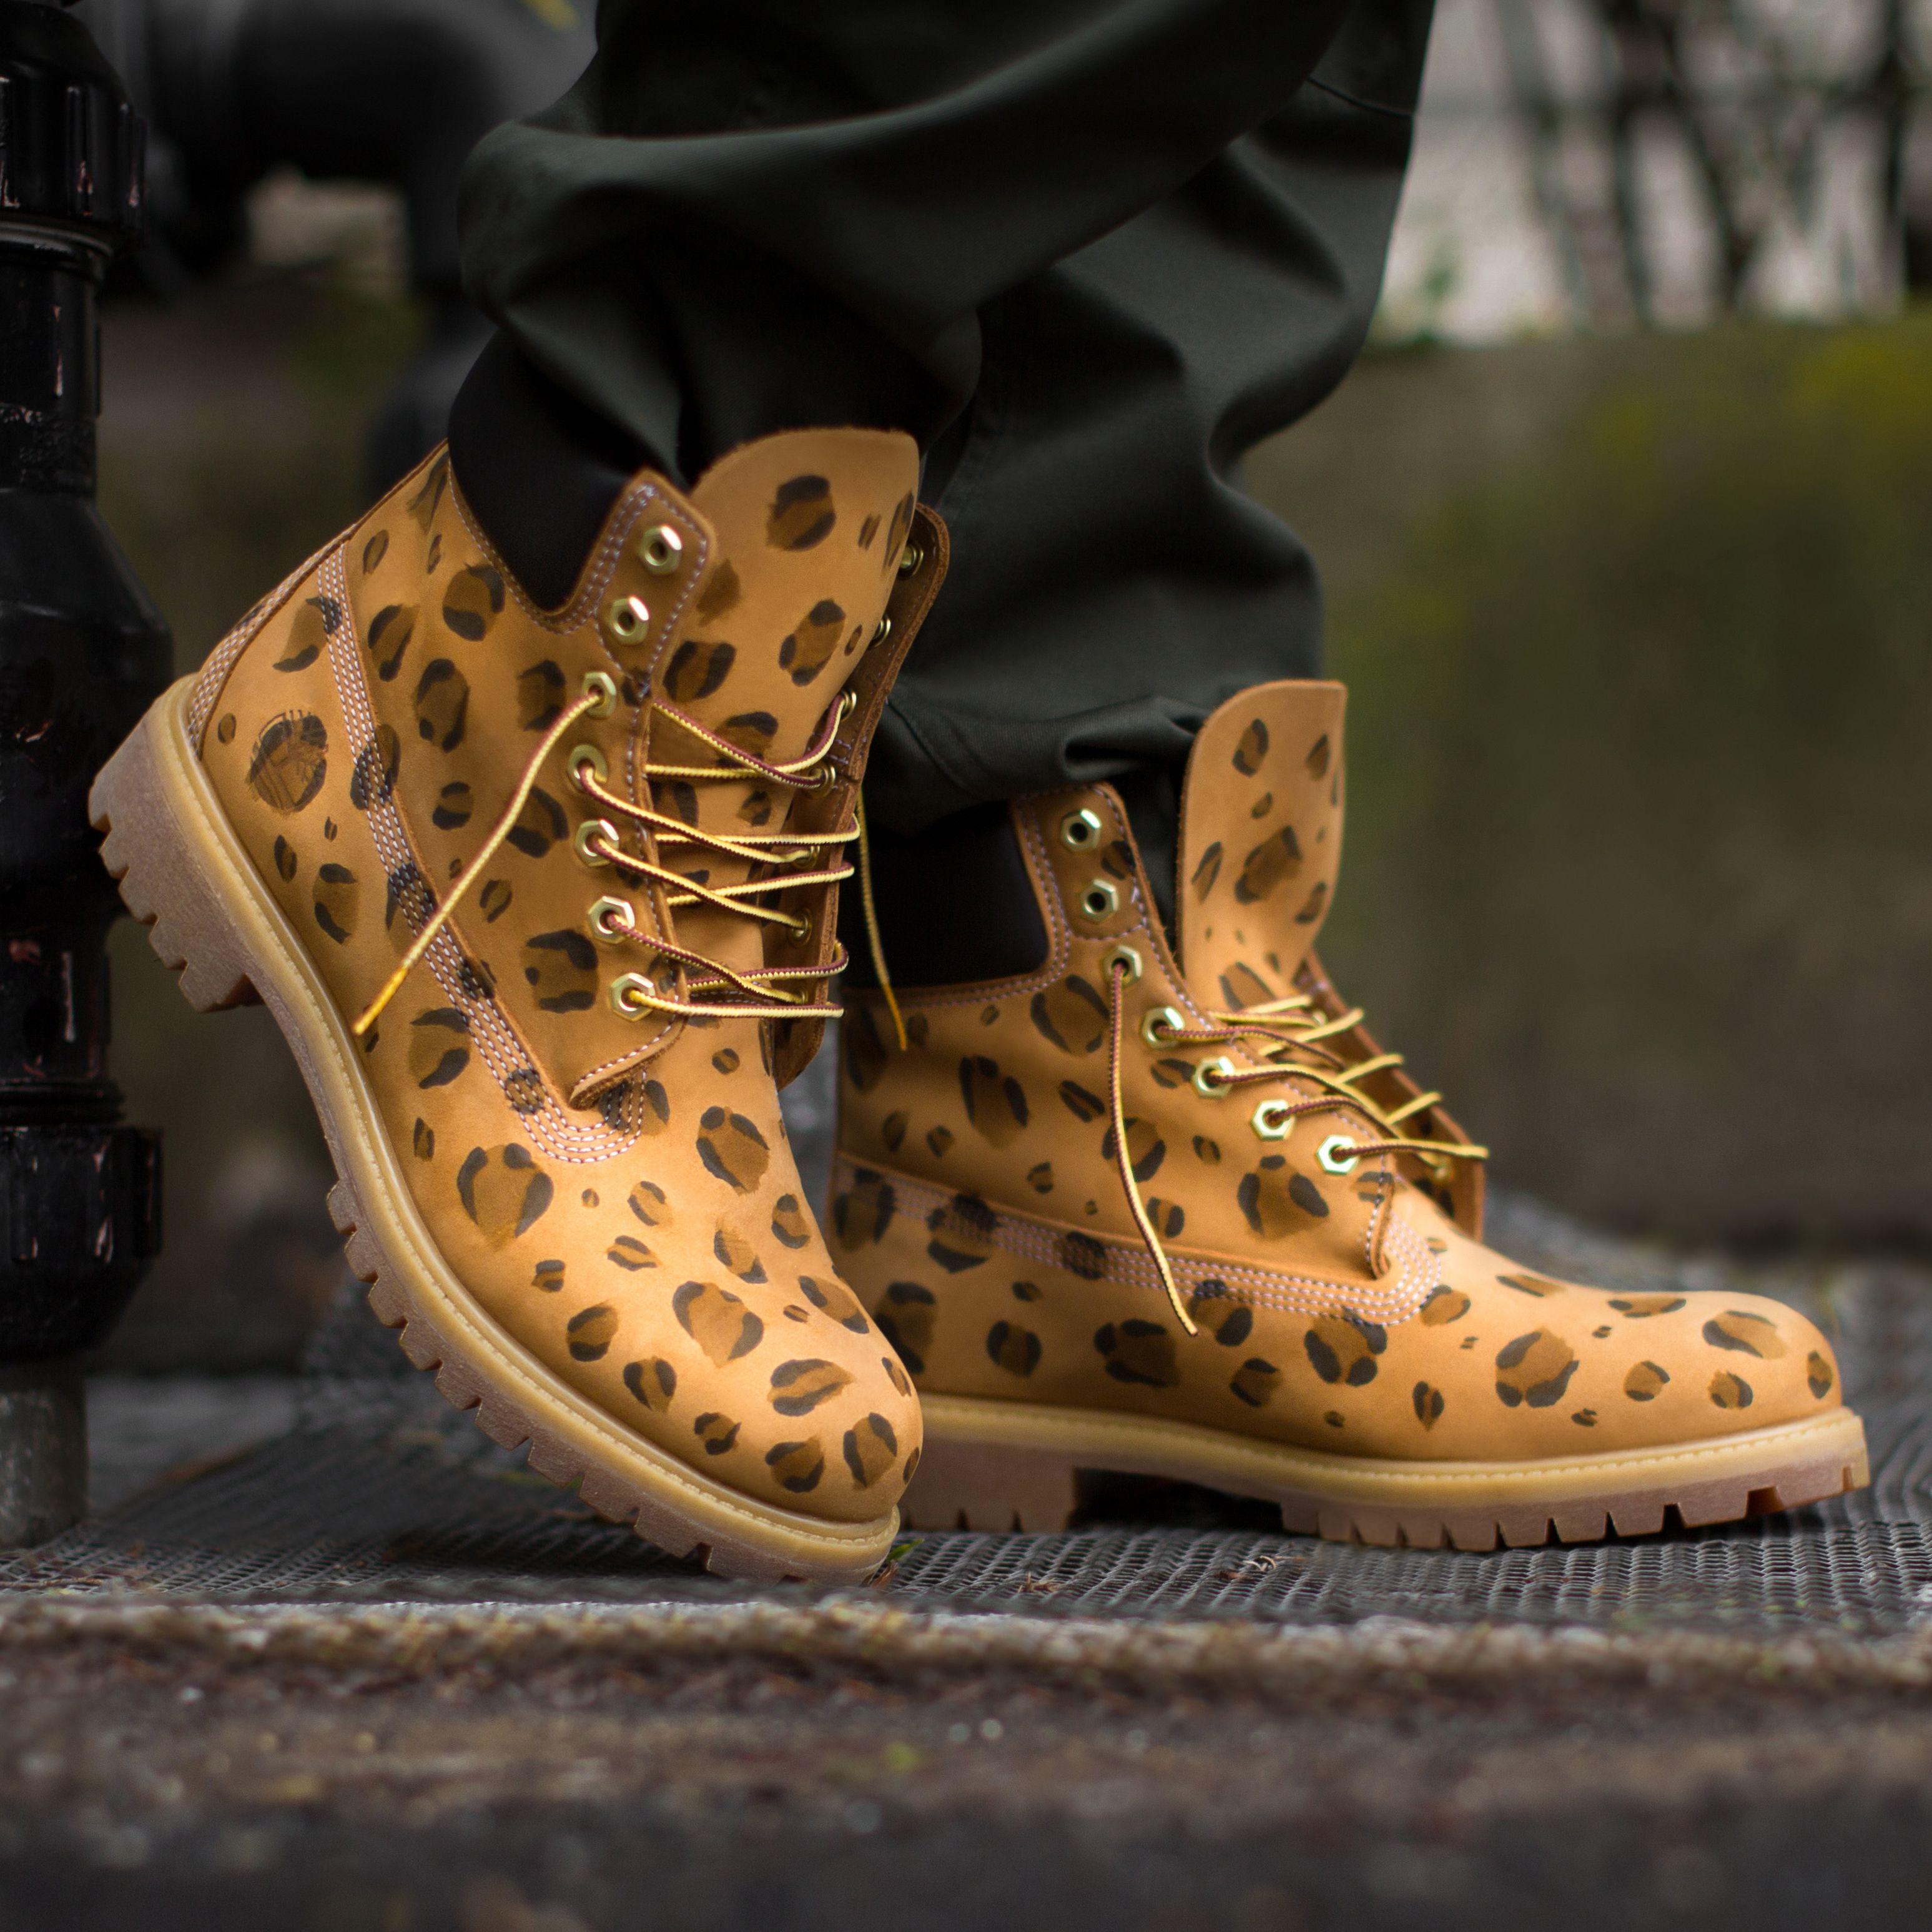 Boots, Timberland boots, Timberland